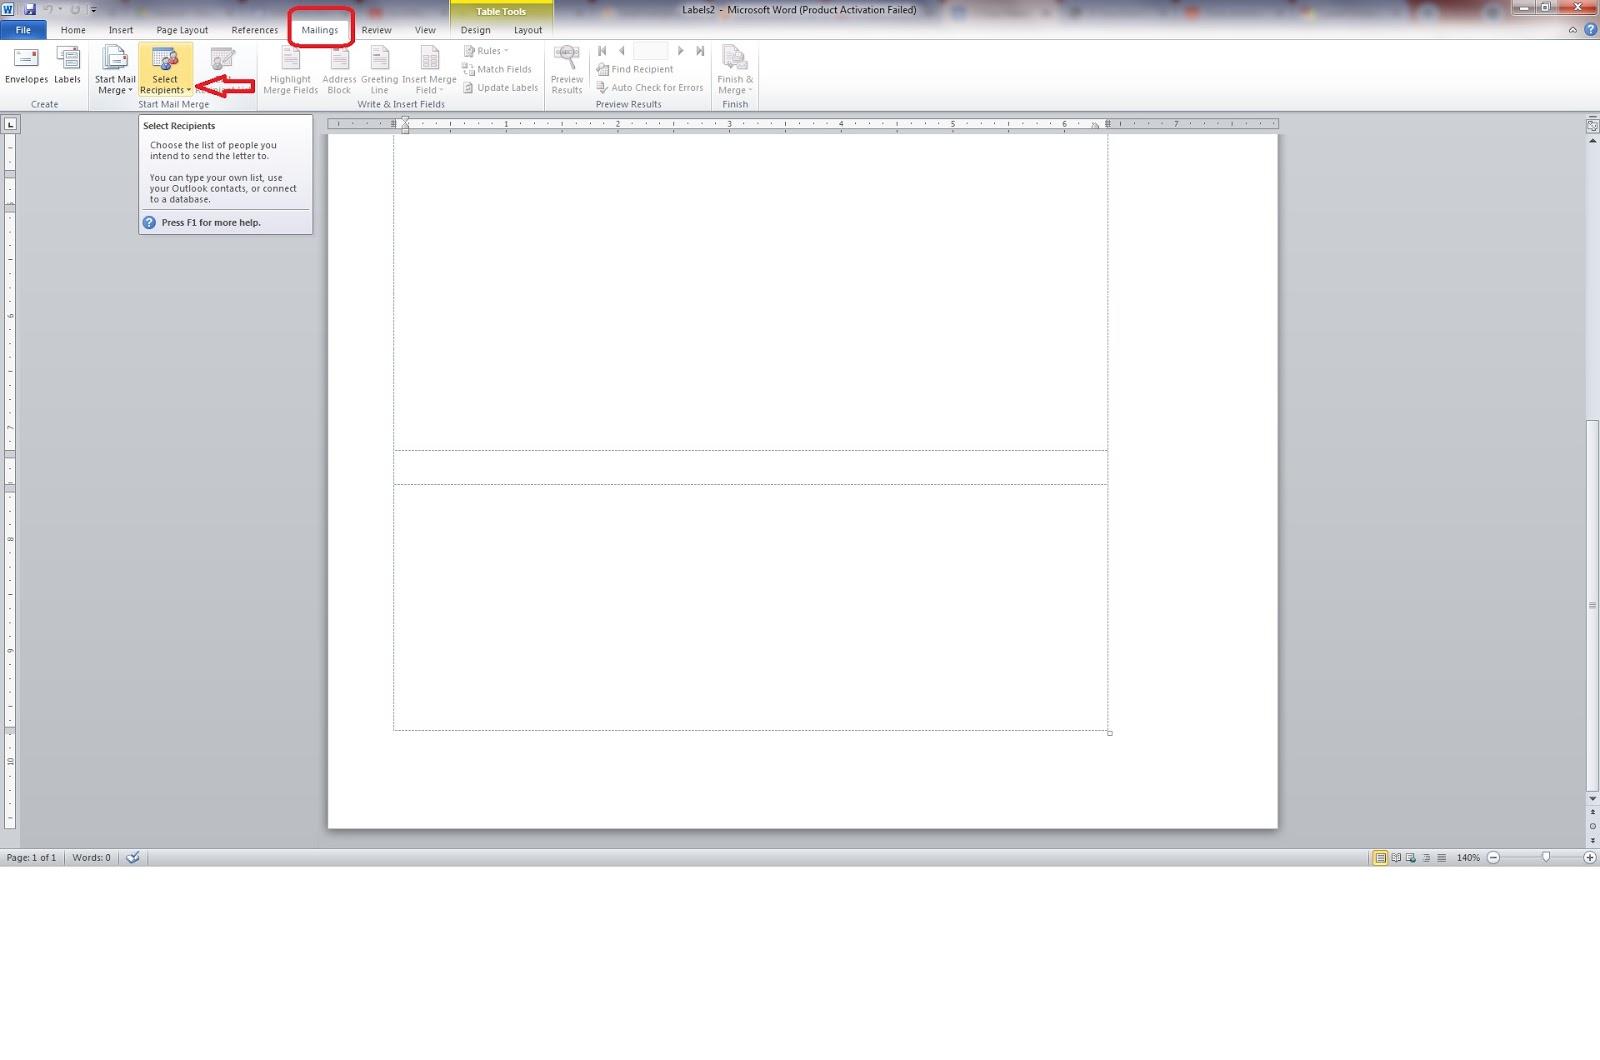 Integrasi Data Excel & Word